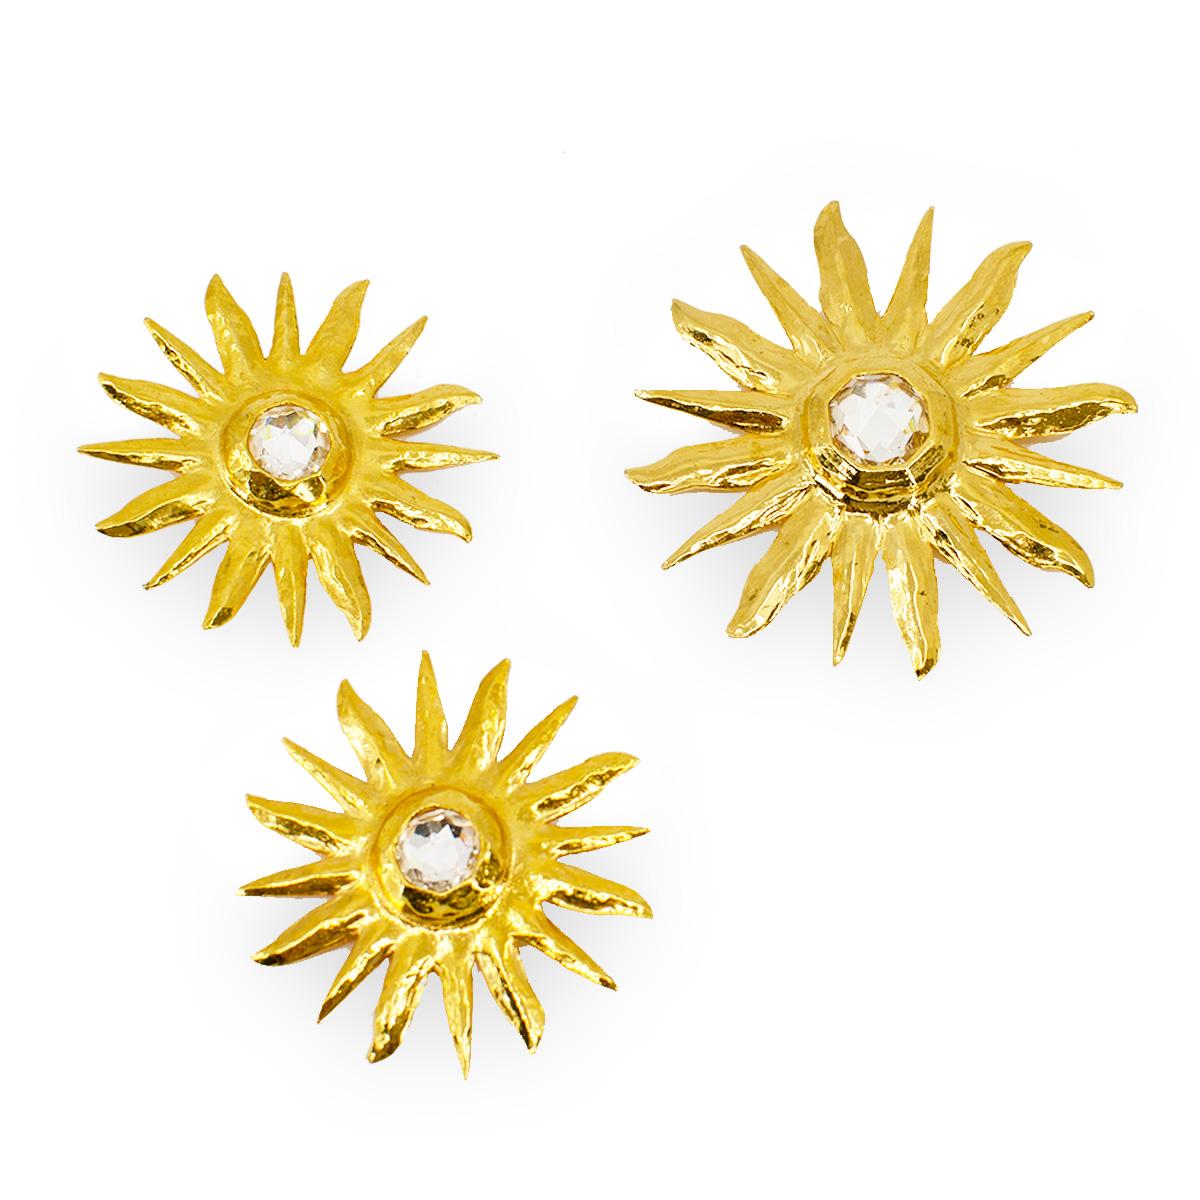 Ysl jewelry by Robert Goossens